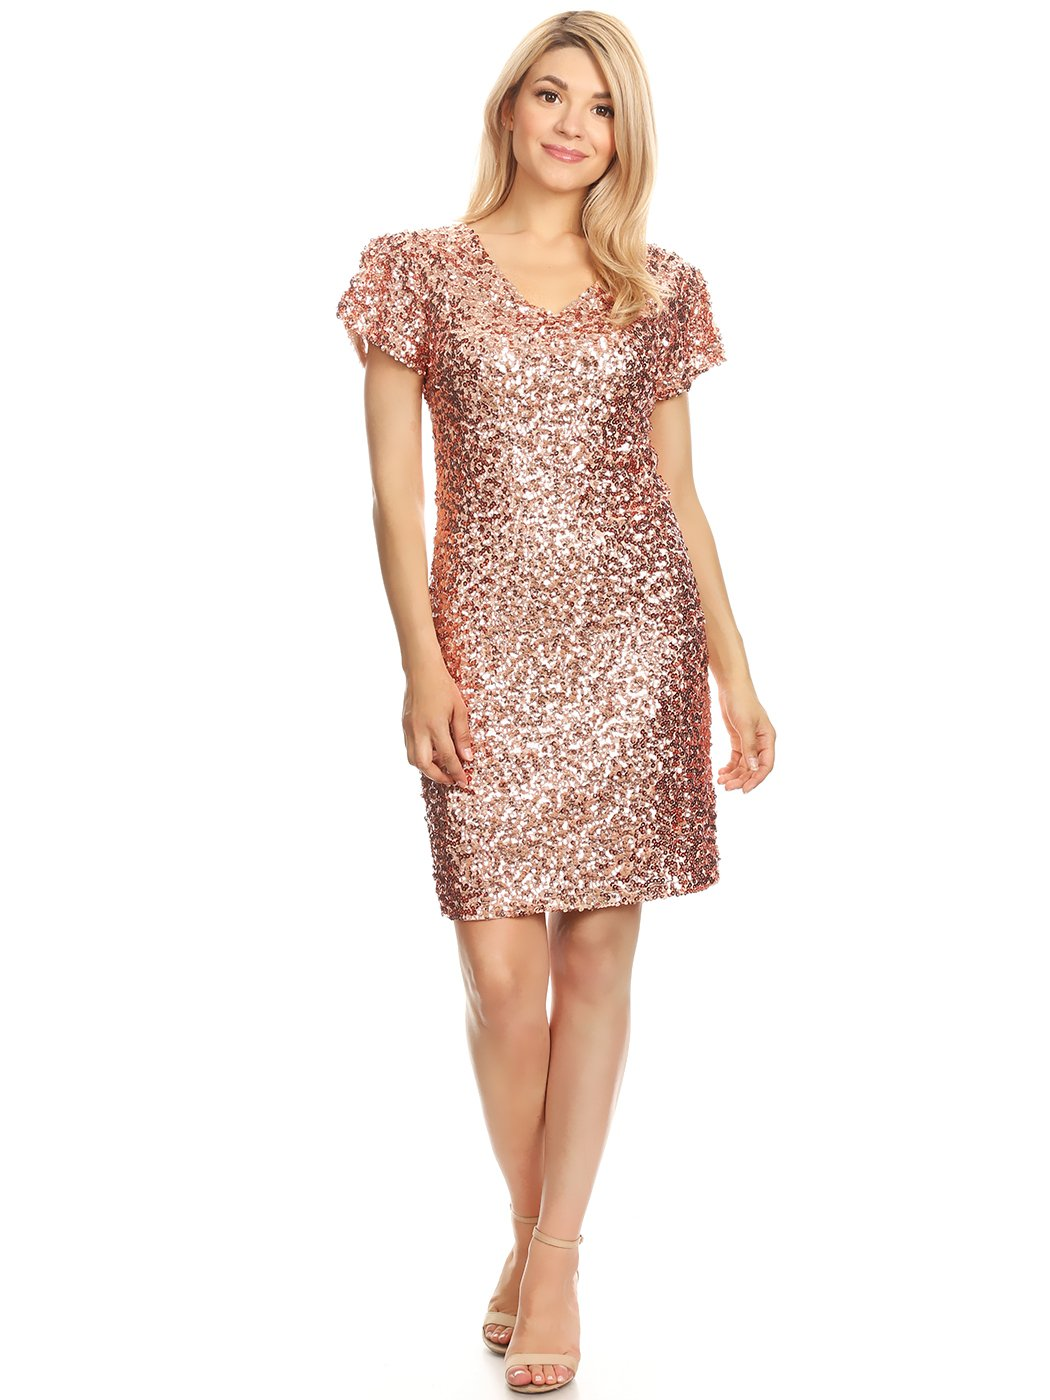 Available at Amazon: Anna-Kaci Women's Sexy Short Sleeve Sequin Bodycon Mini Cocktail Party Club Dress